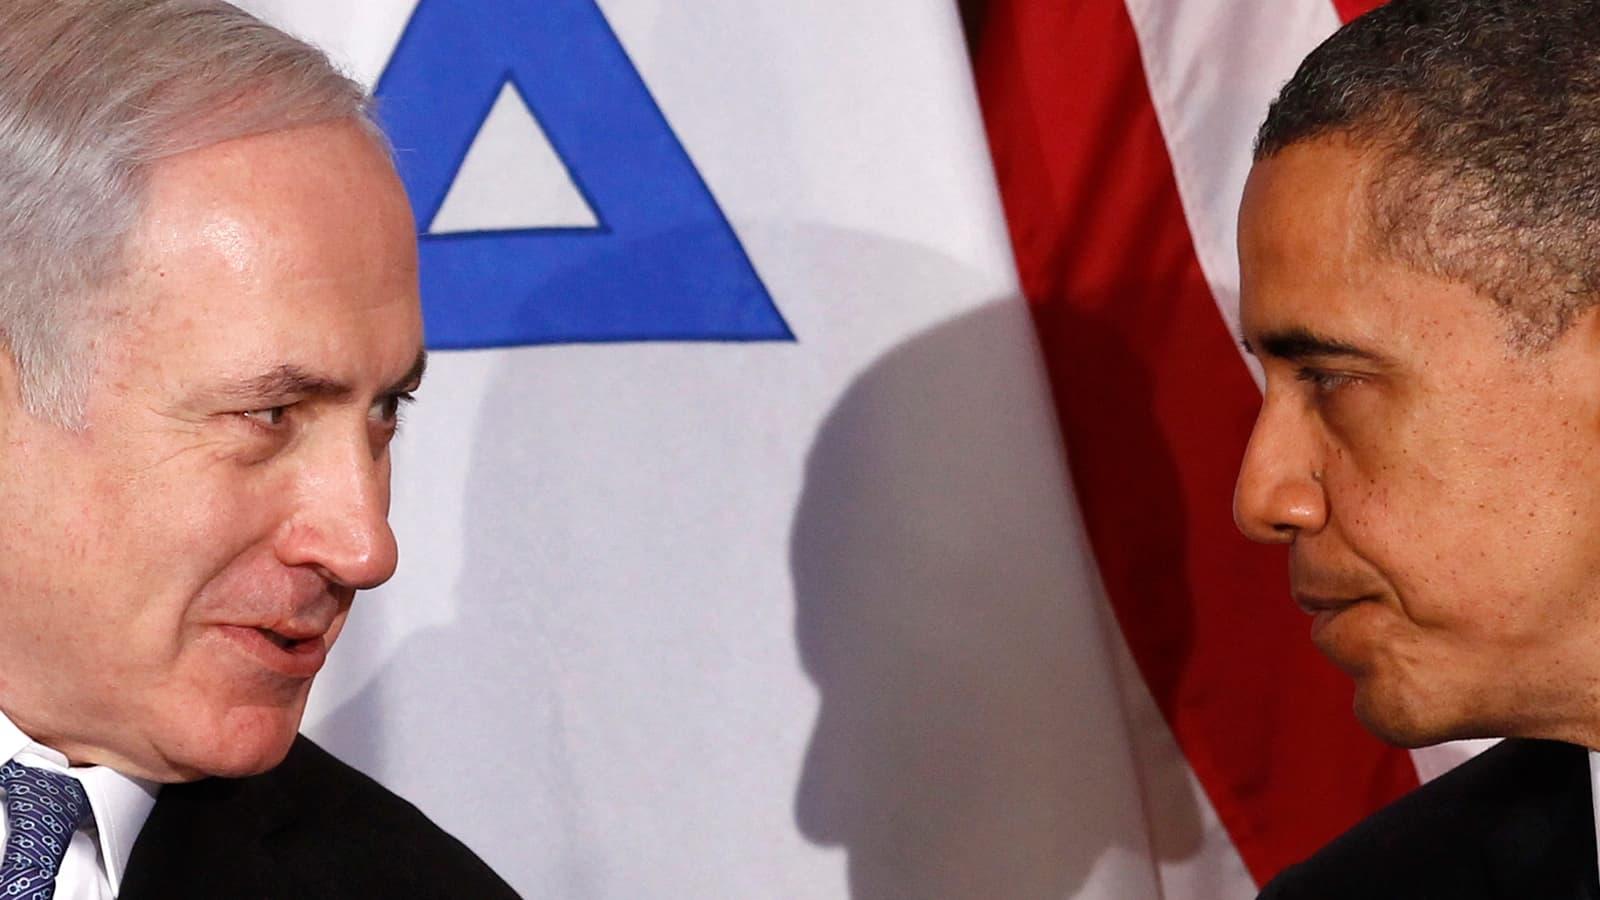 Boehner, Netanyahu Cross A Very Serious Line